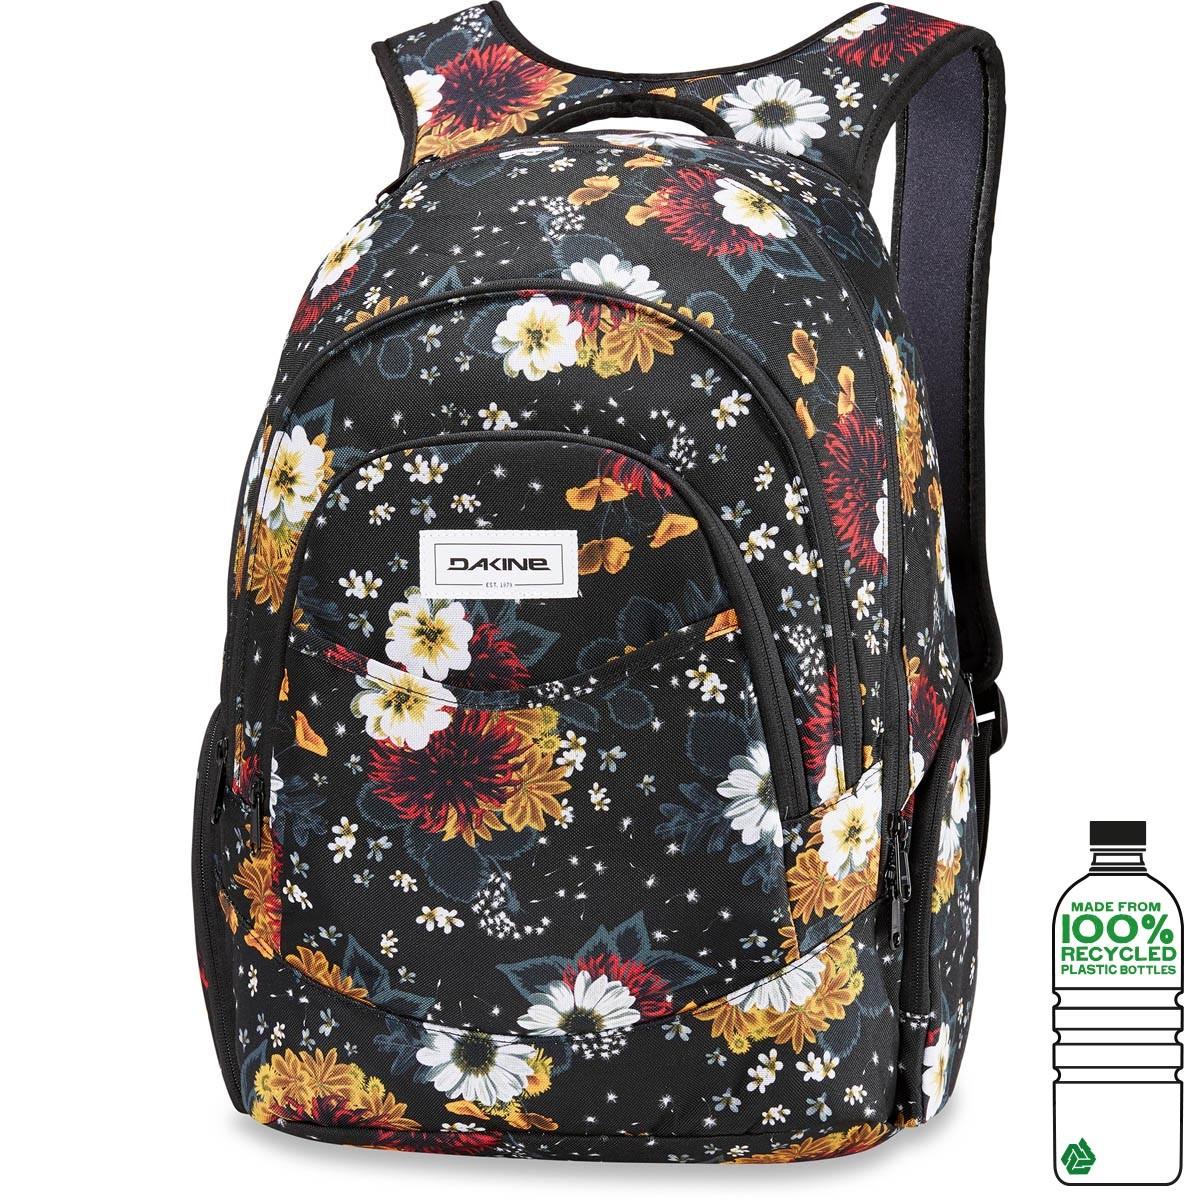 cdd0ba9b270d9 Dakine Prom 25L Backpack Winter Daisy